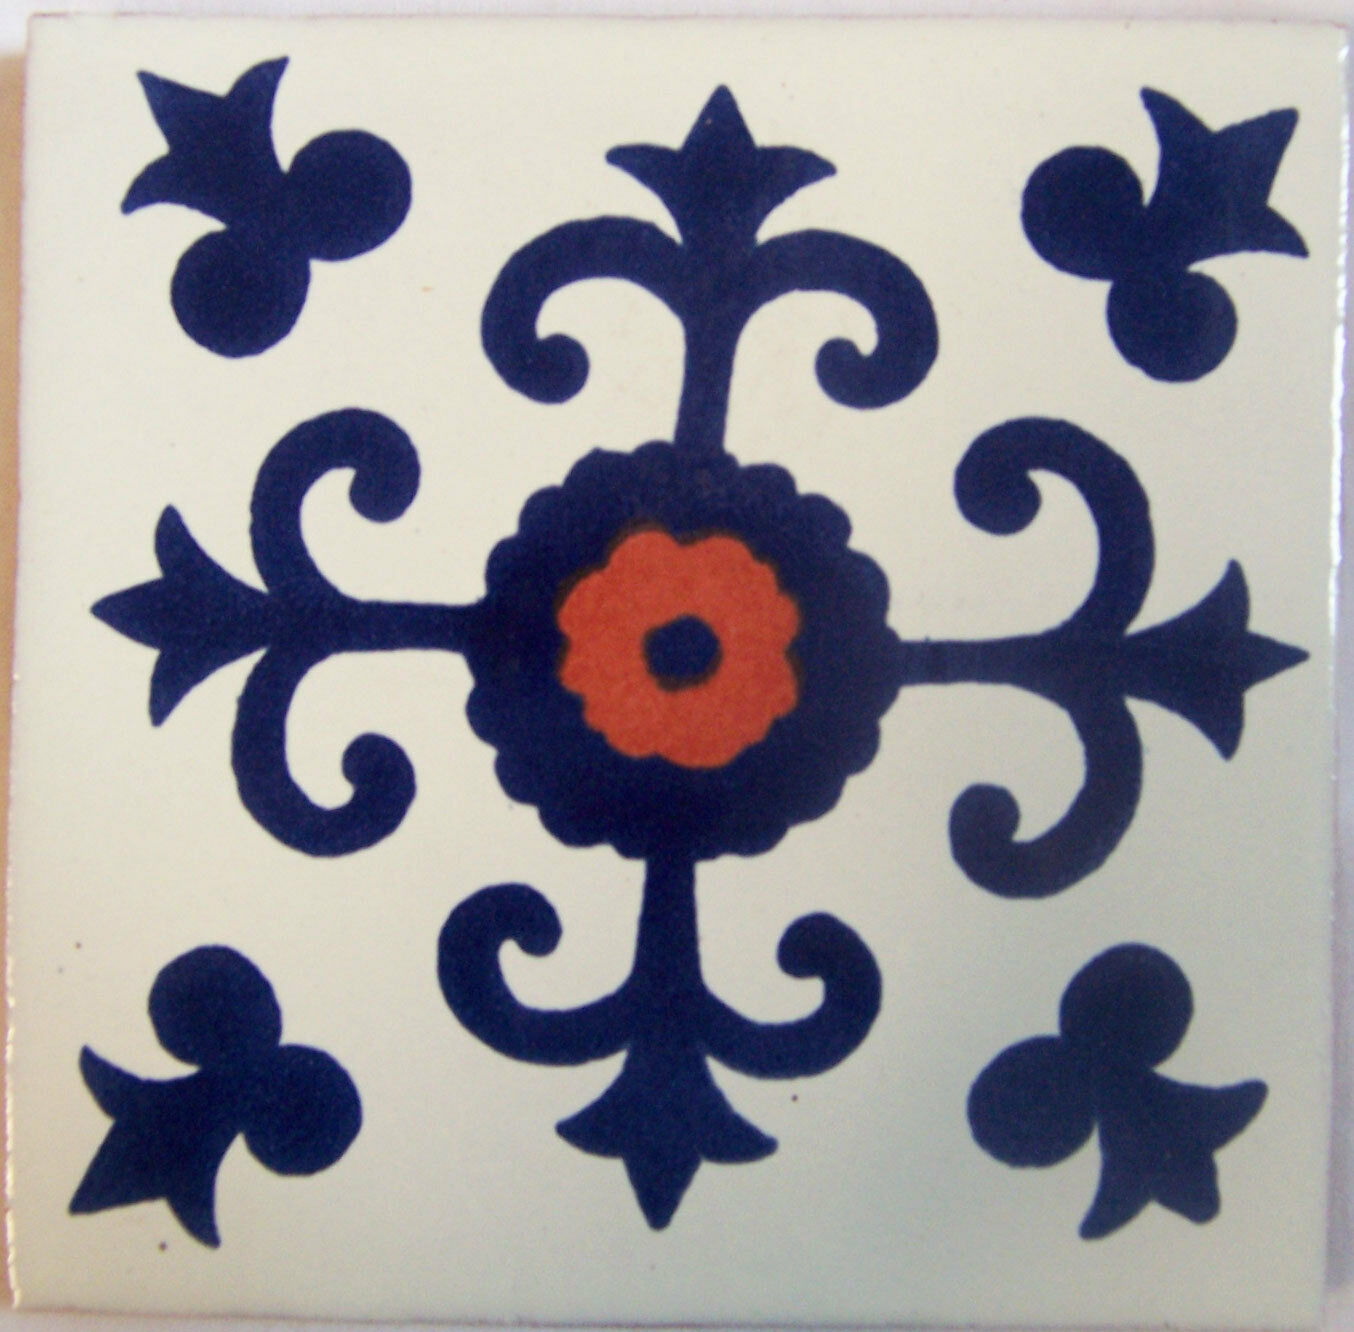 C286- Mexican Handmade Talavera Clay Tile Folk Art 4x4